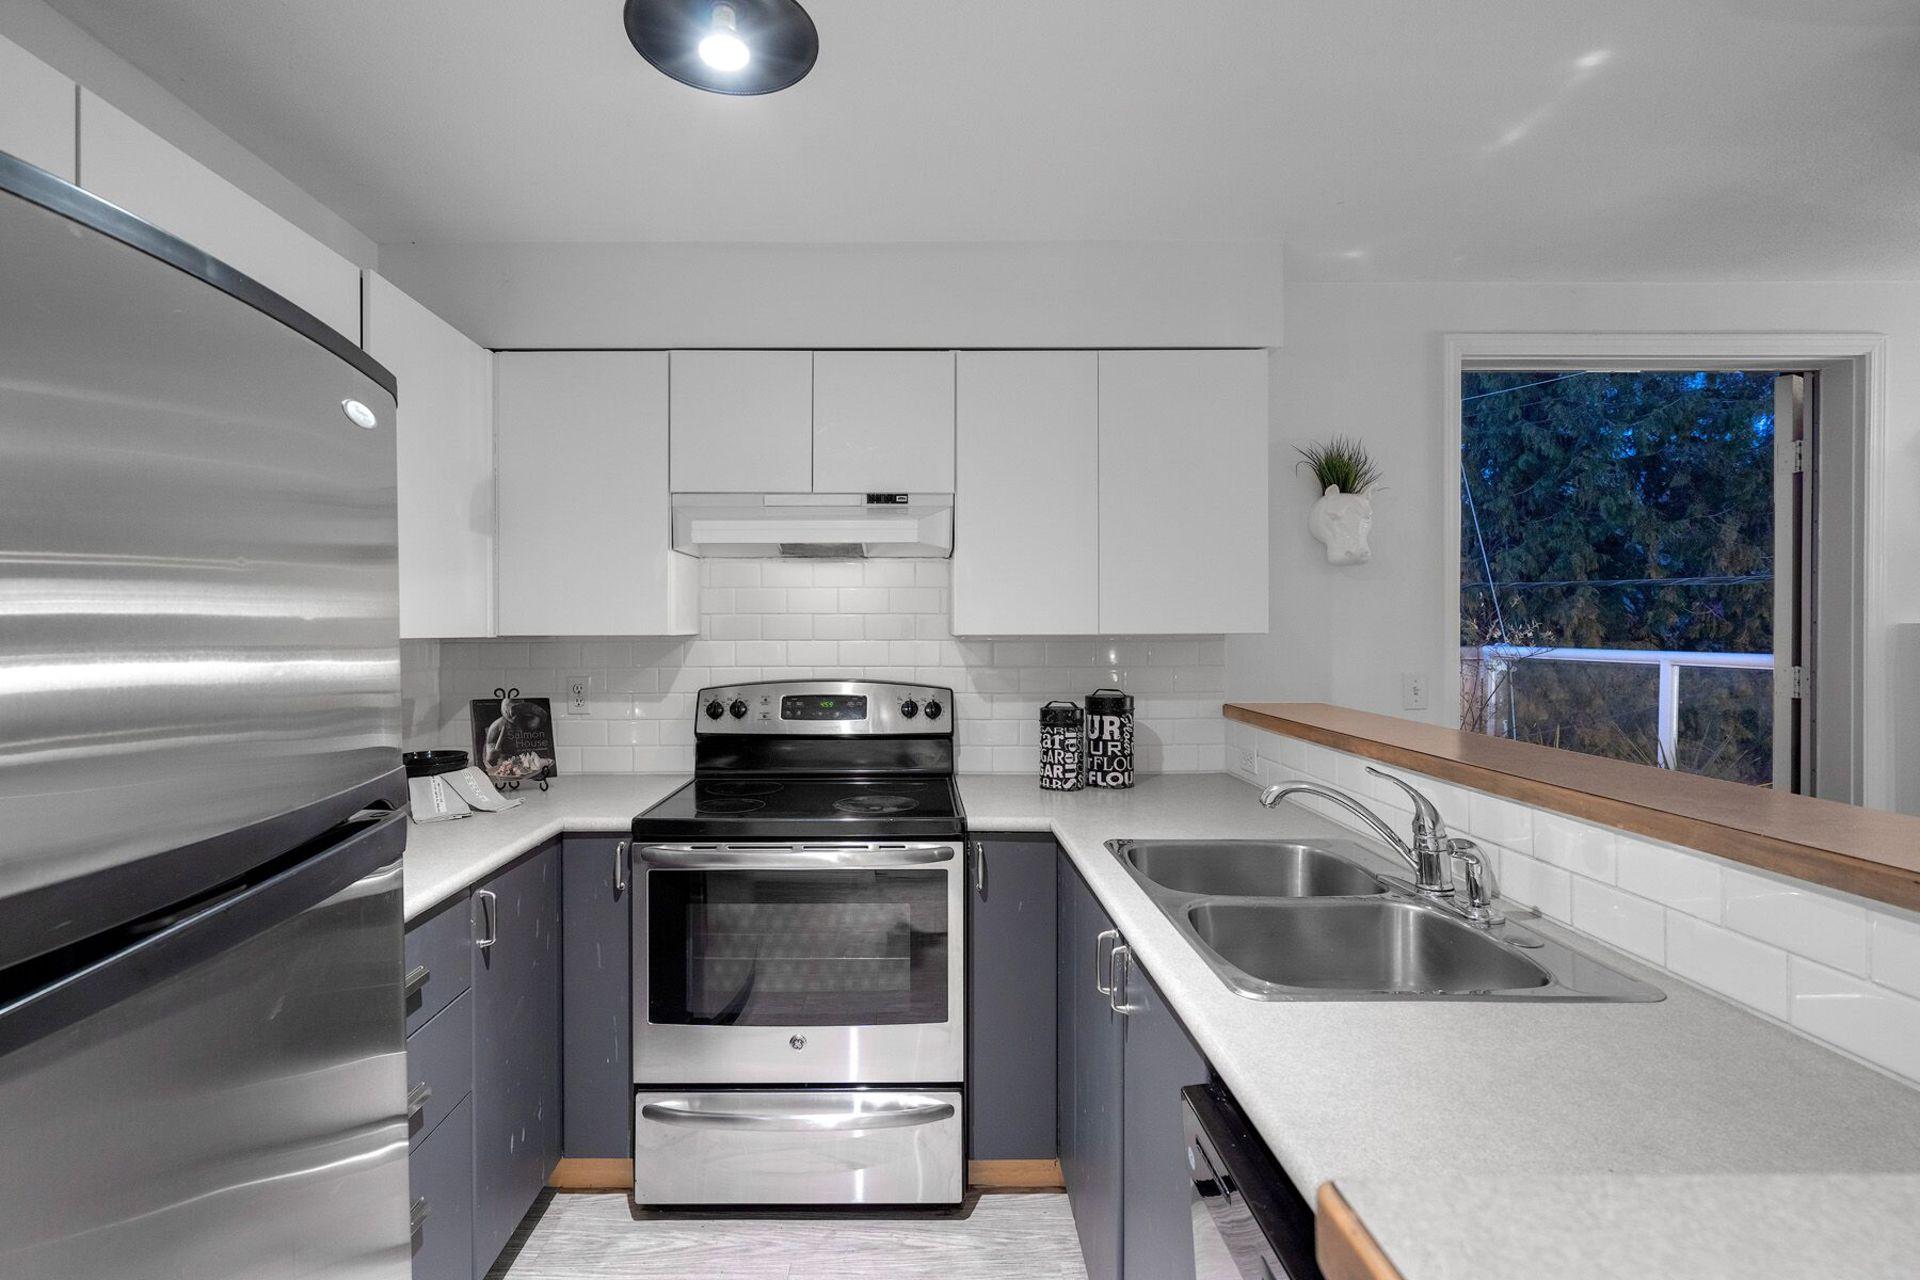 ydjmko_q at 211 - 1707 Charles Street, Grandview Woodland, Vancouver East